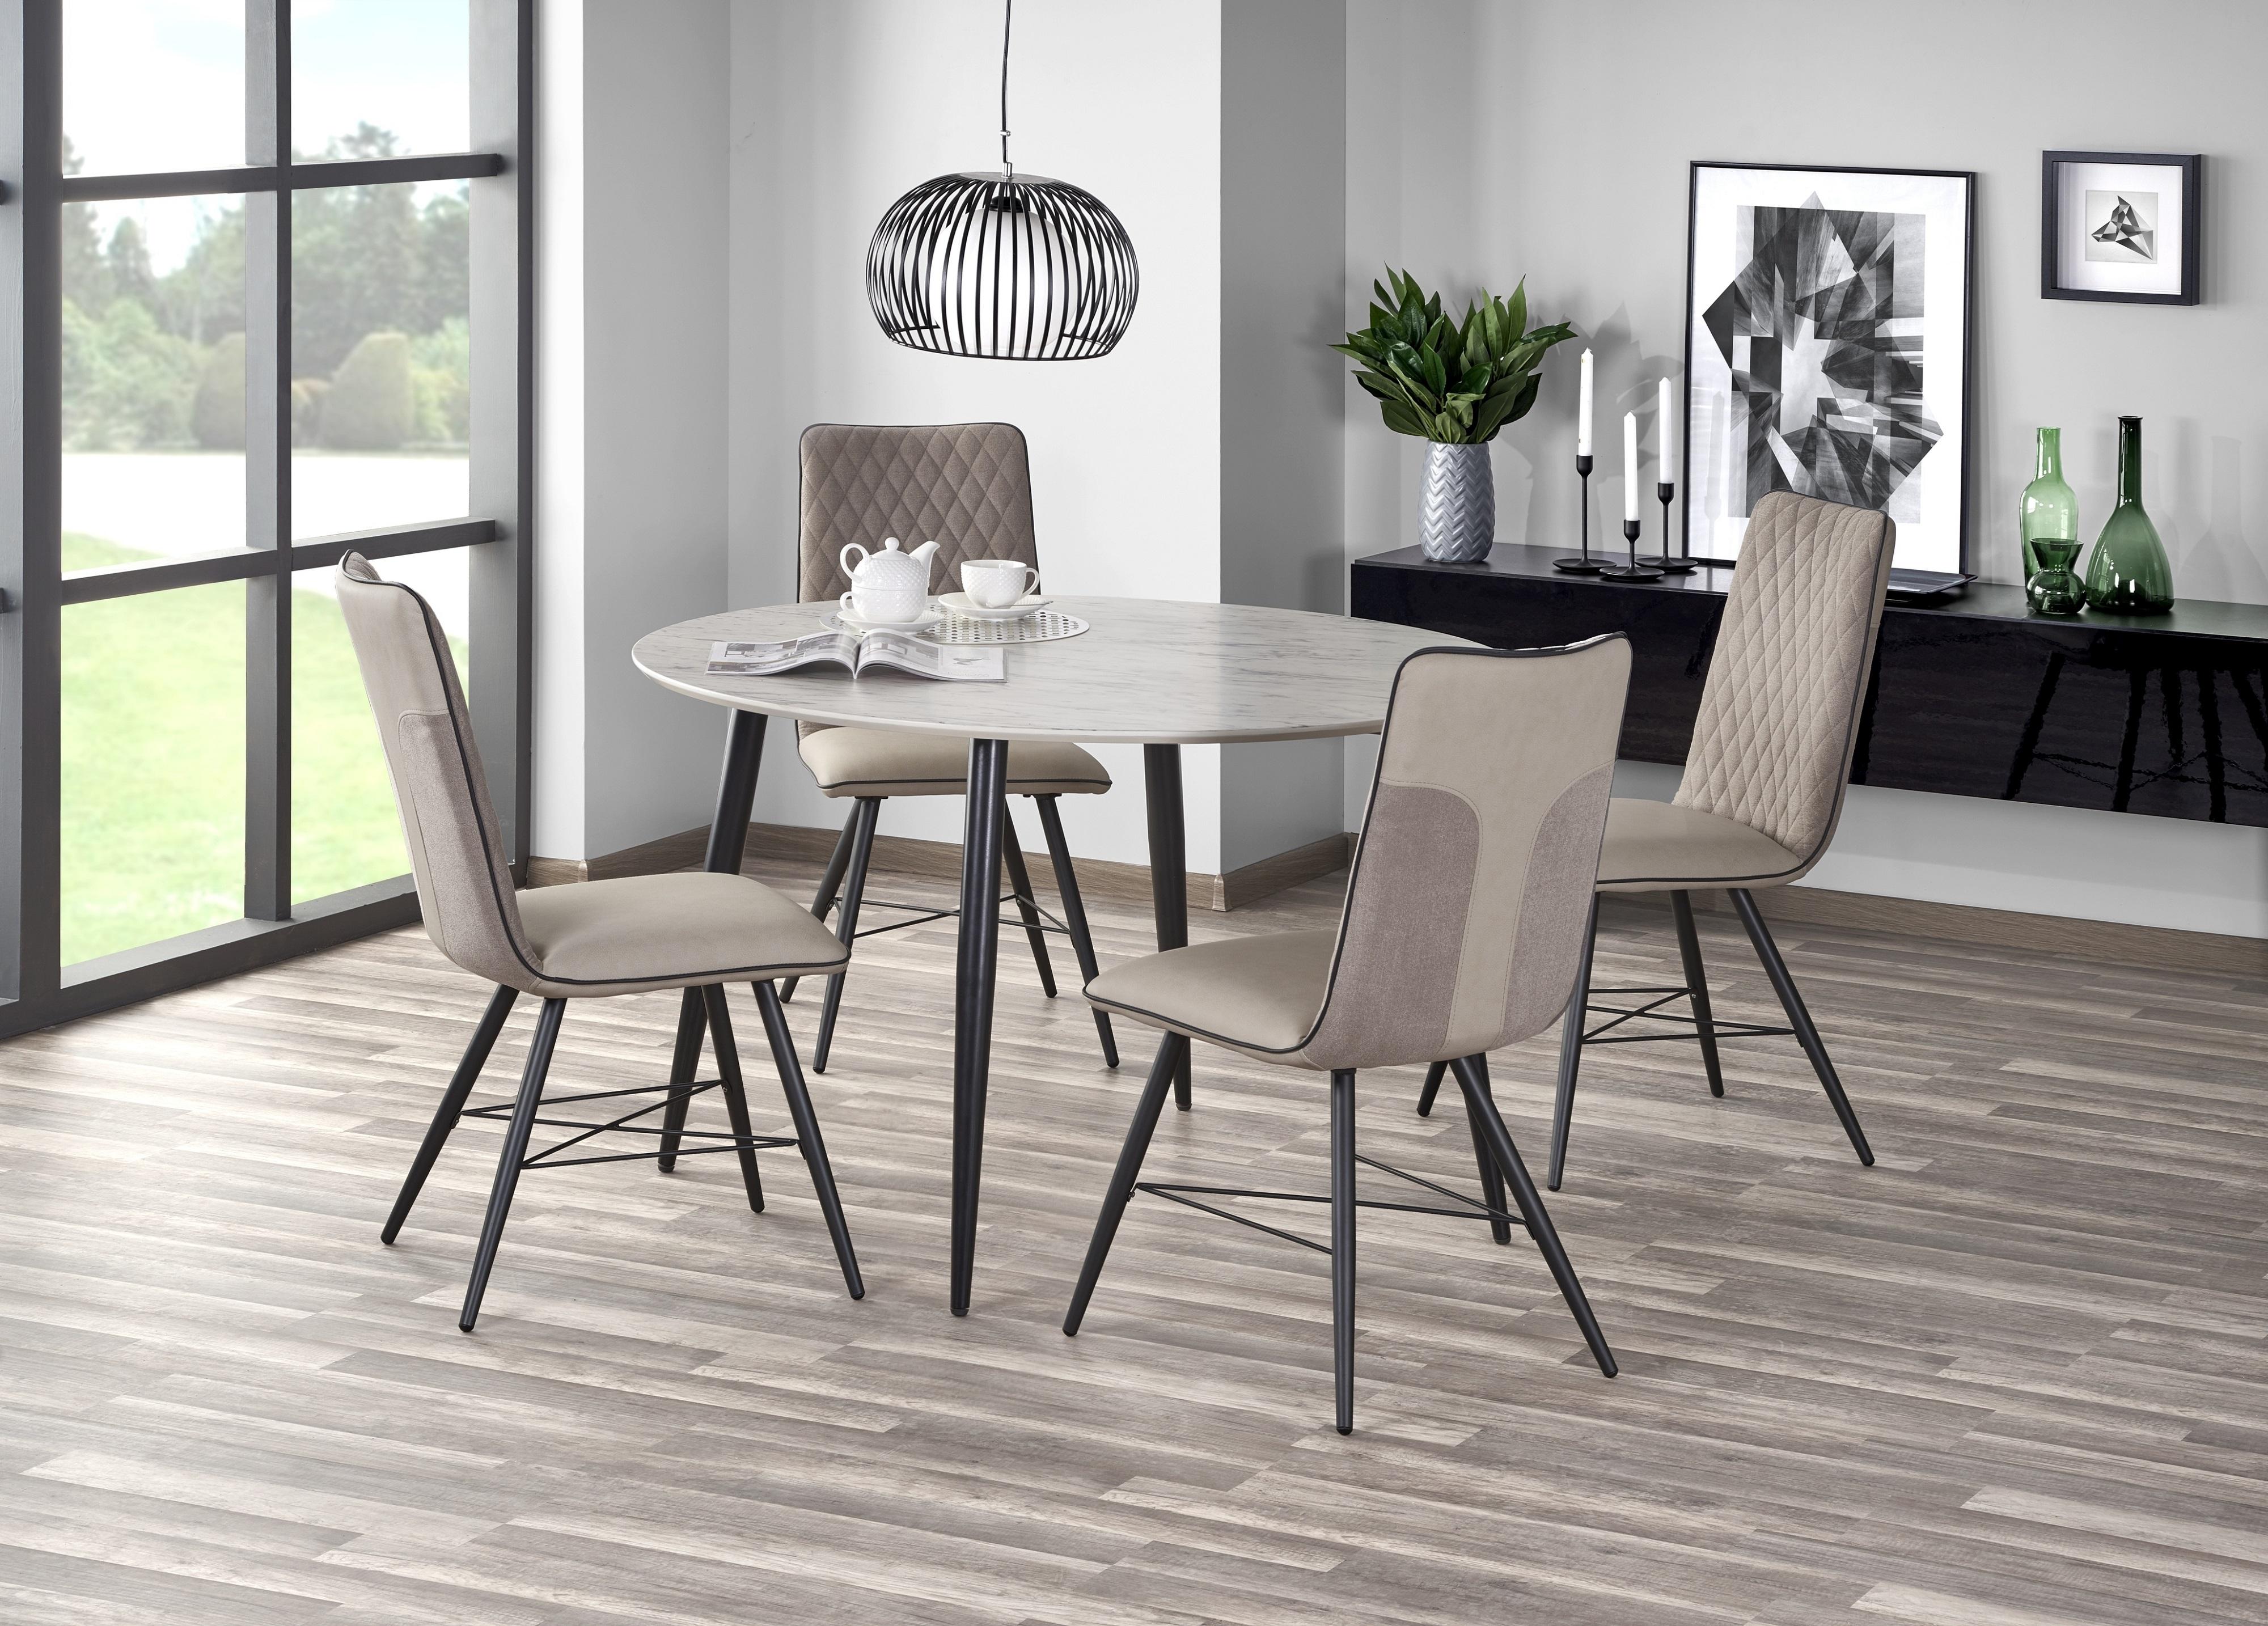 Set masa din MDF si metal Belato Cream / Black + 4 scaune tapitate cu stofa, cu picioare din metal K289 Beige, Ø120xH76 cm imagine